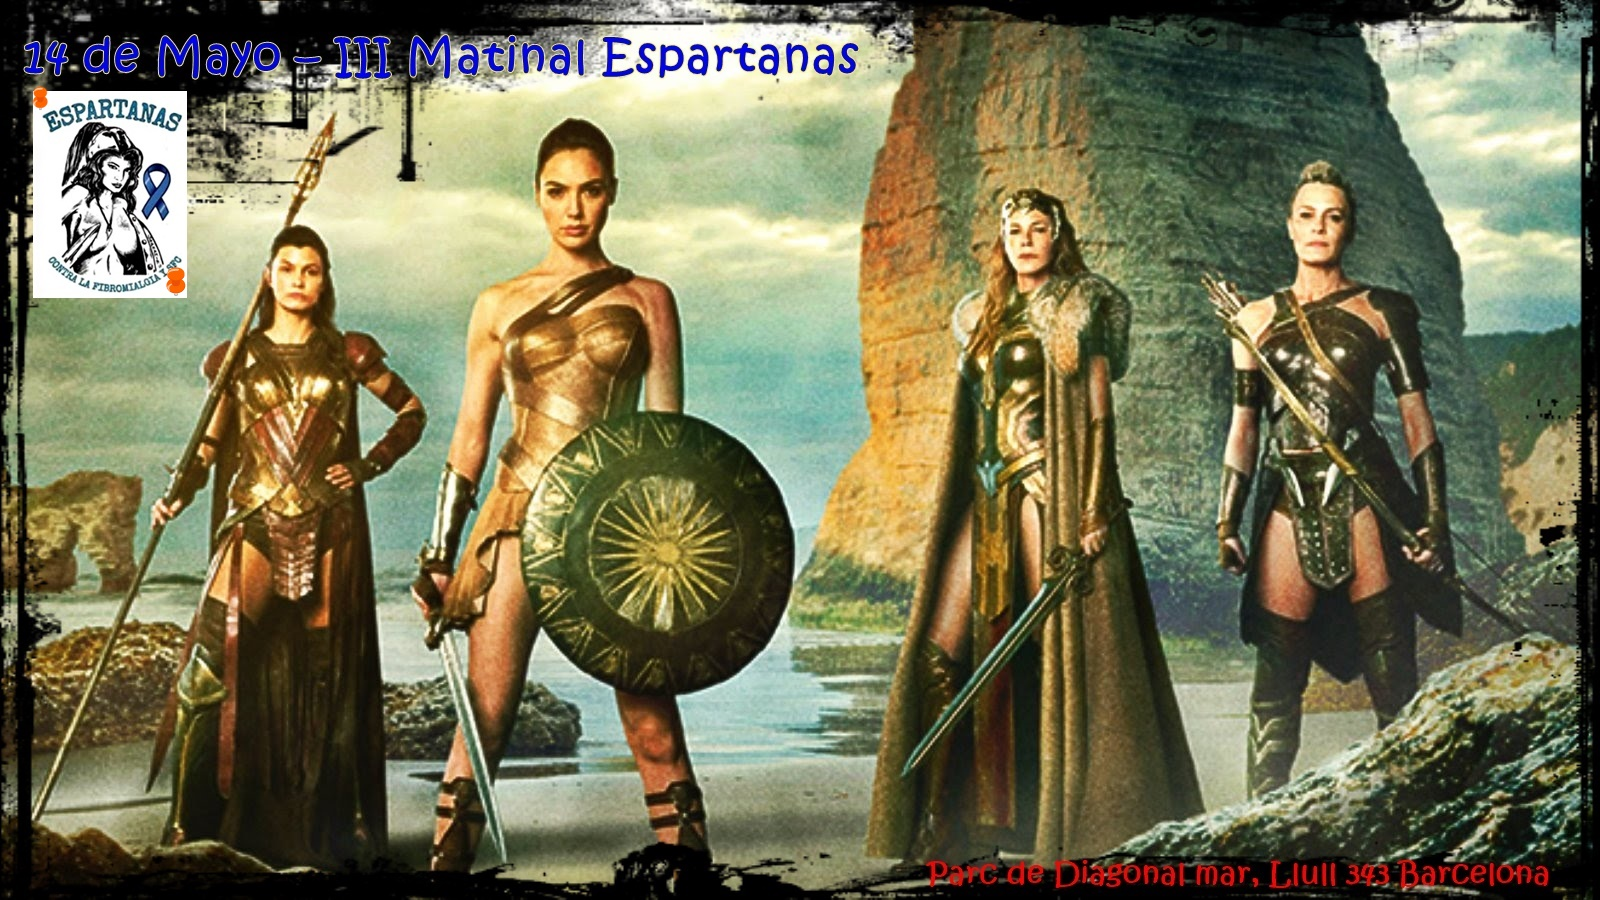 III Matinal espartanas 14%2Bde%2BMayo%2B%25E2%2580%2593%2BIII%2BMatinal%2BEspartanas